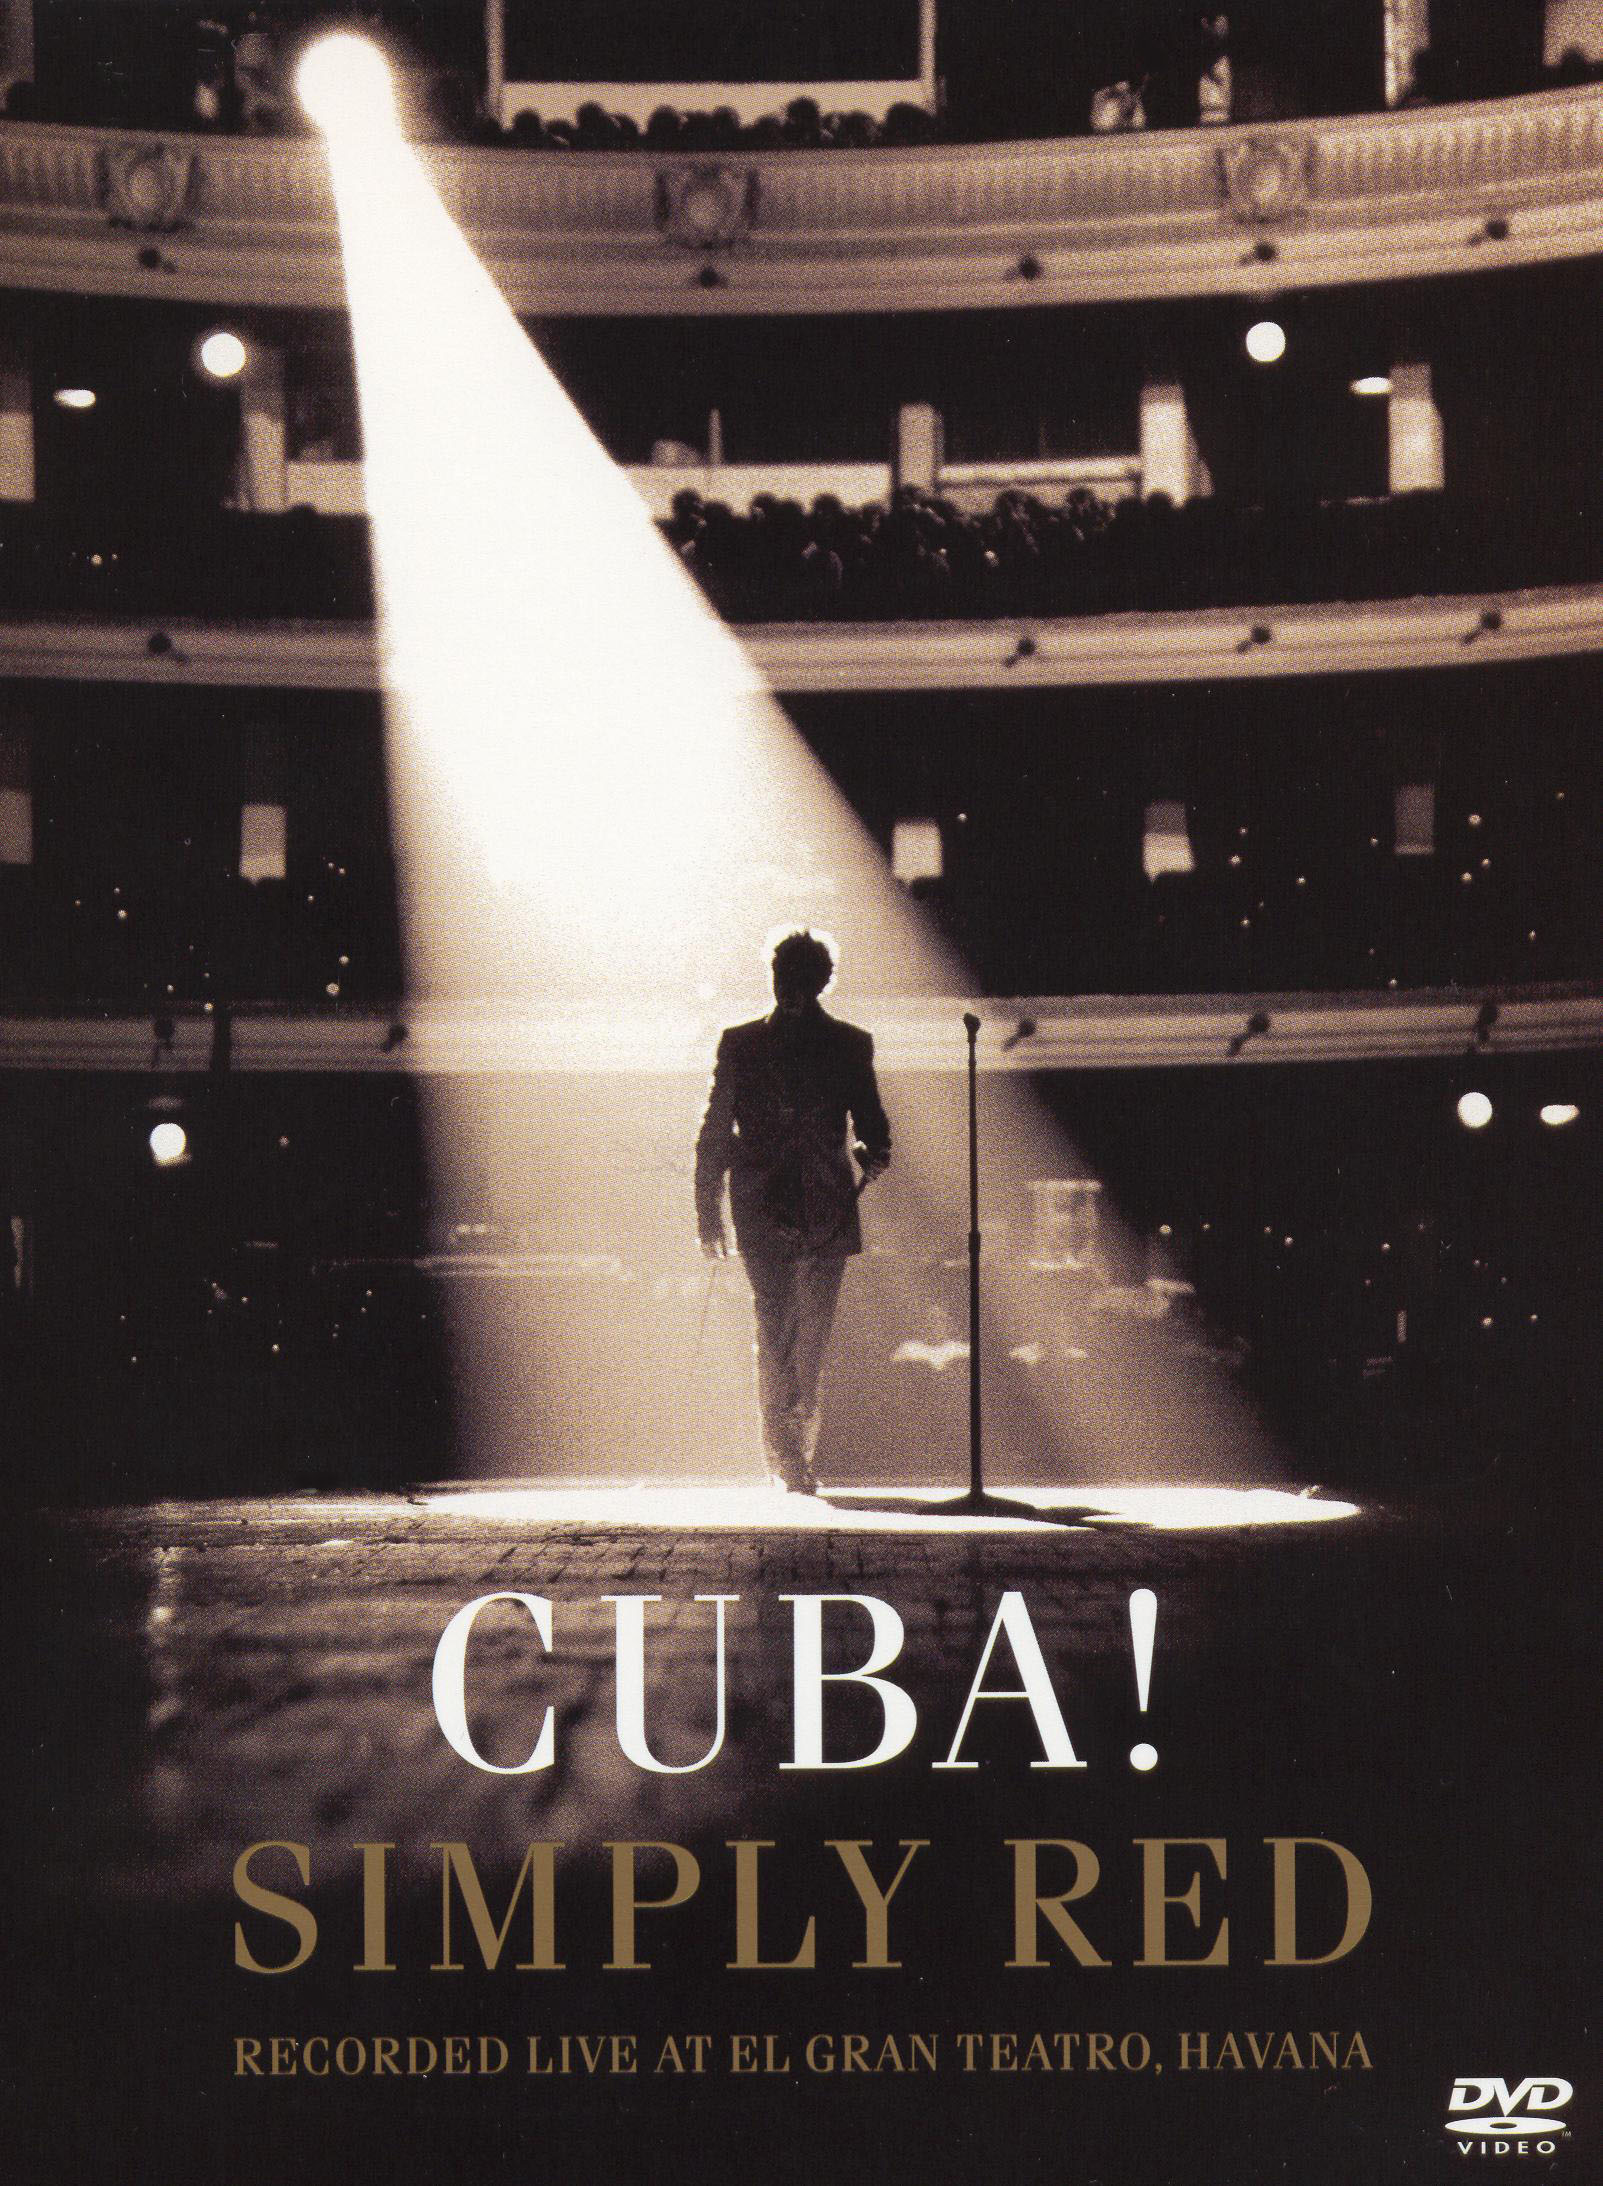 Simply Red: Cuba!